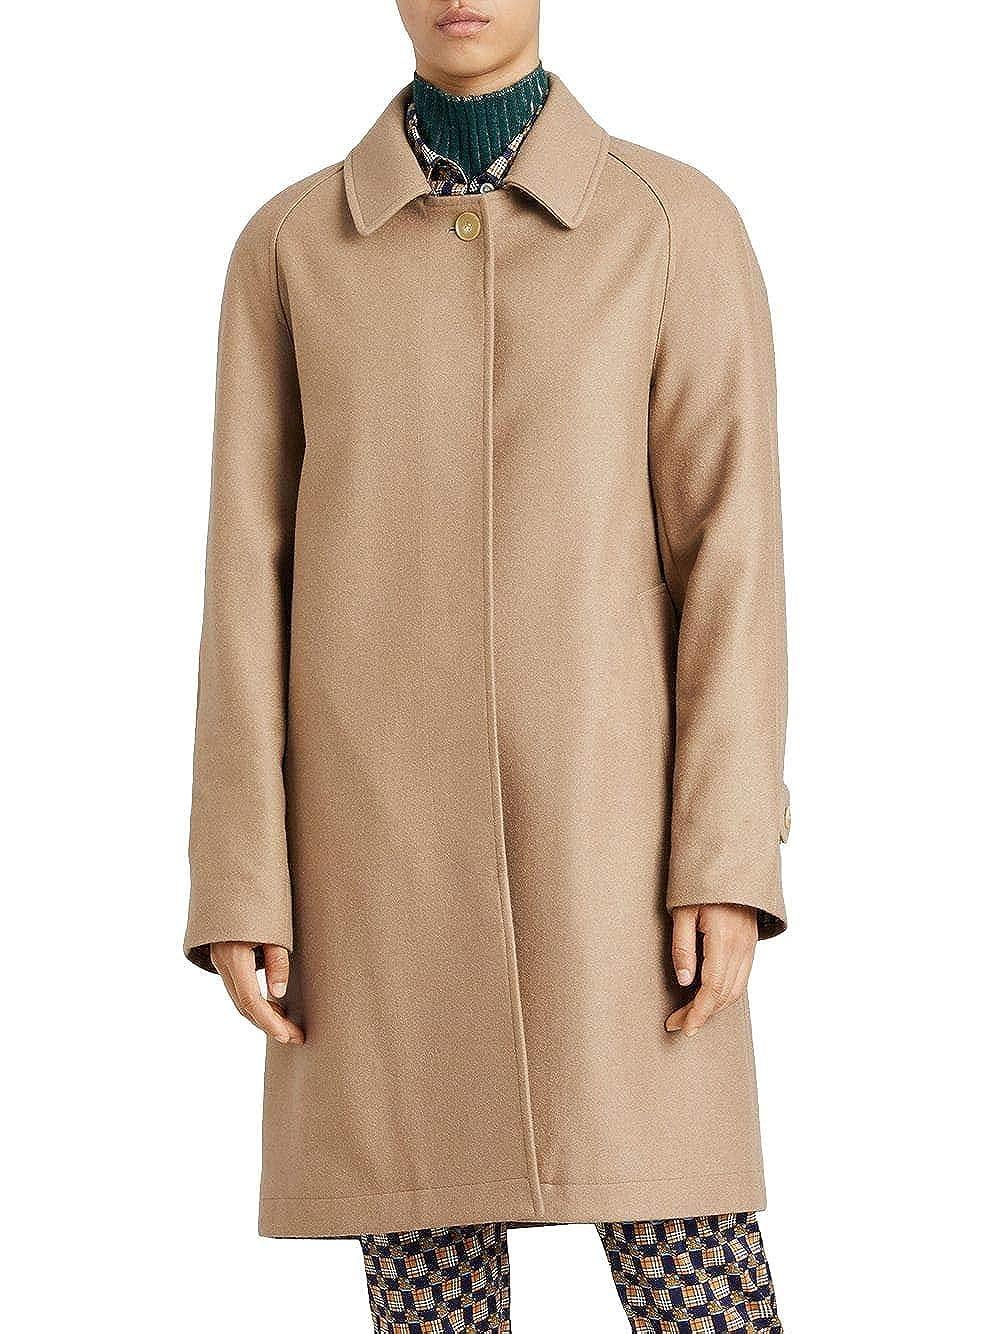 Mantel Braun Damen 8002882 BURBERRY Luxury Fashion m0wN8nv